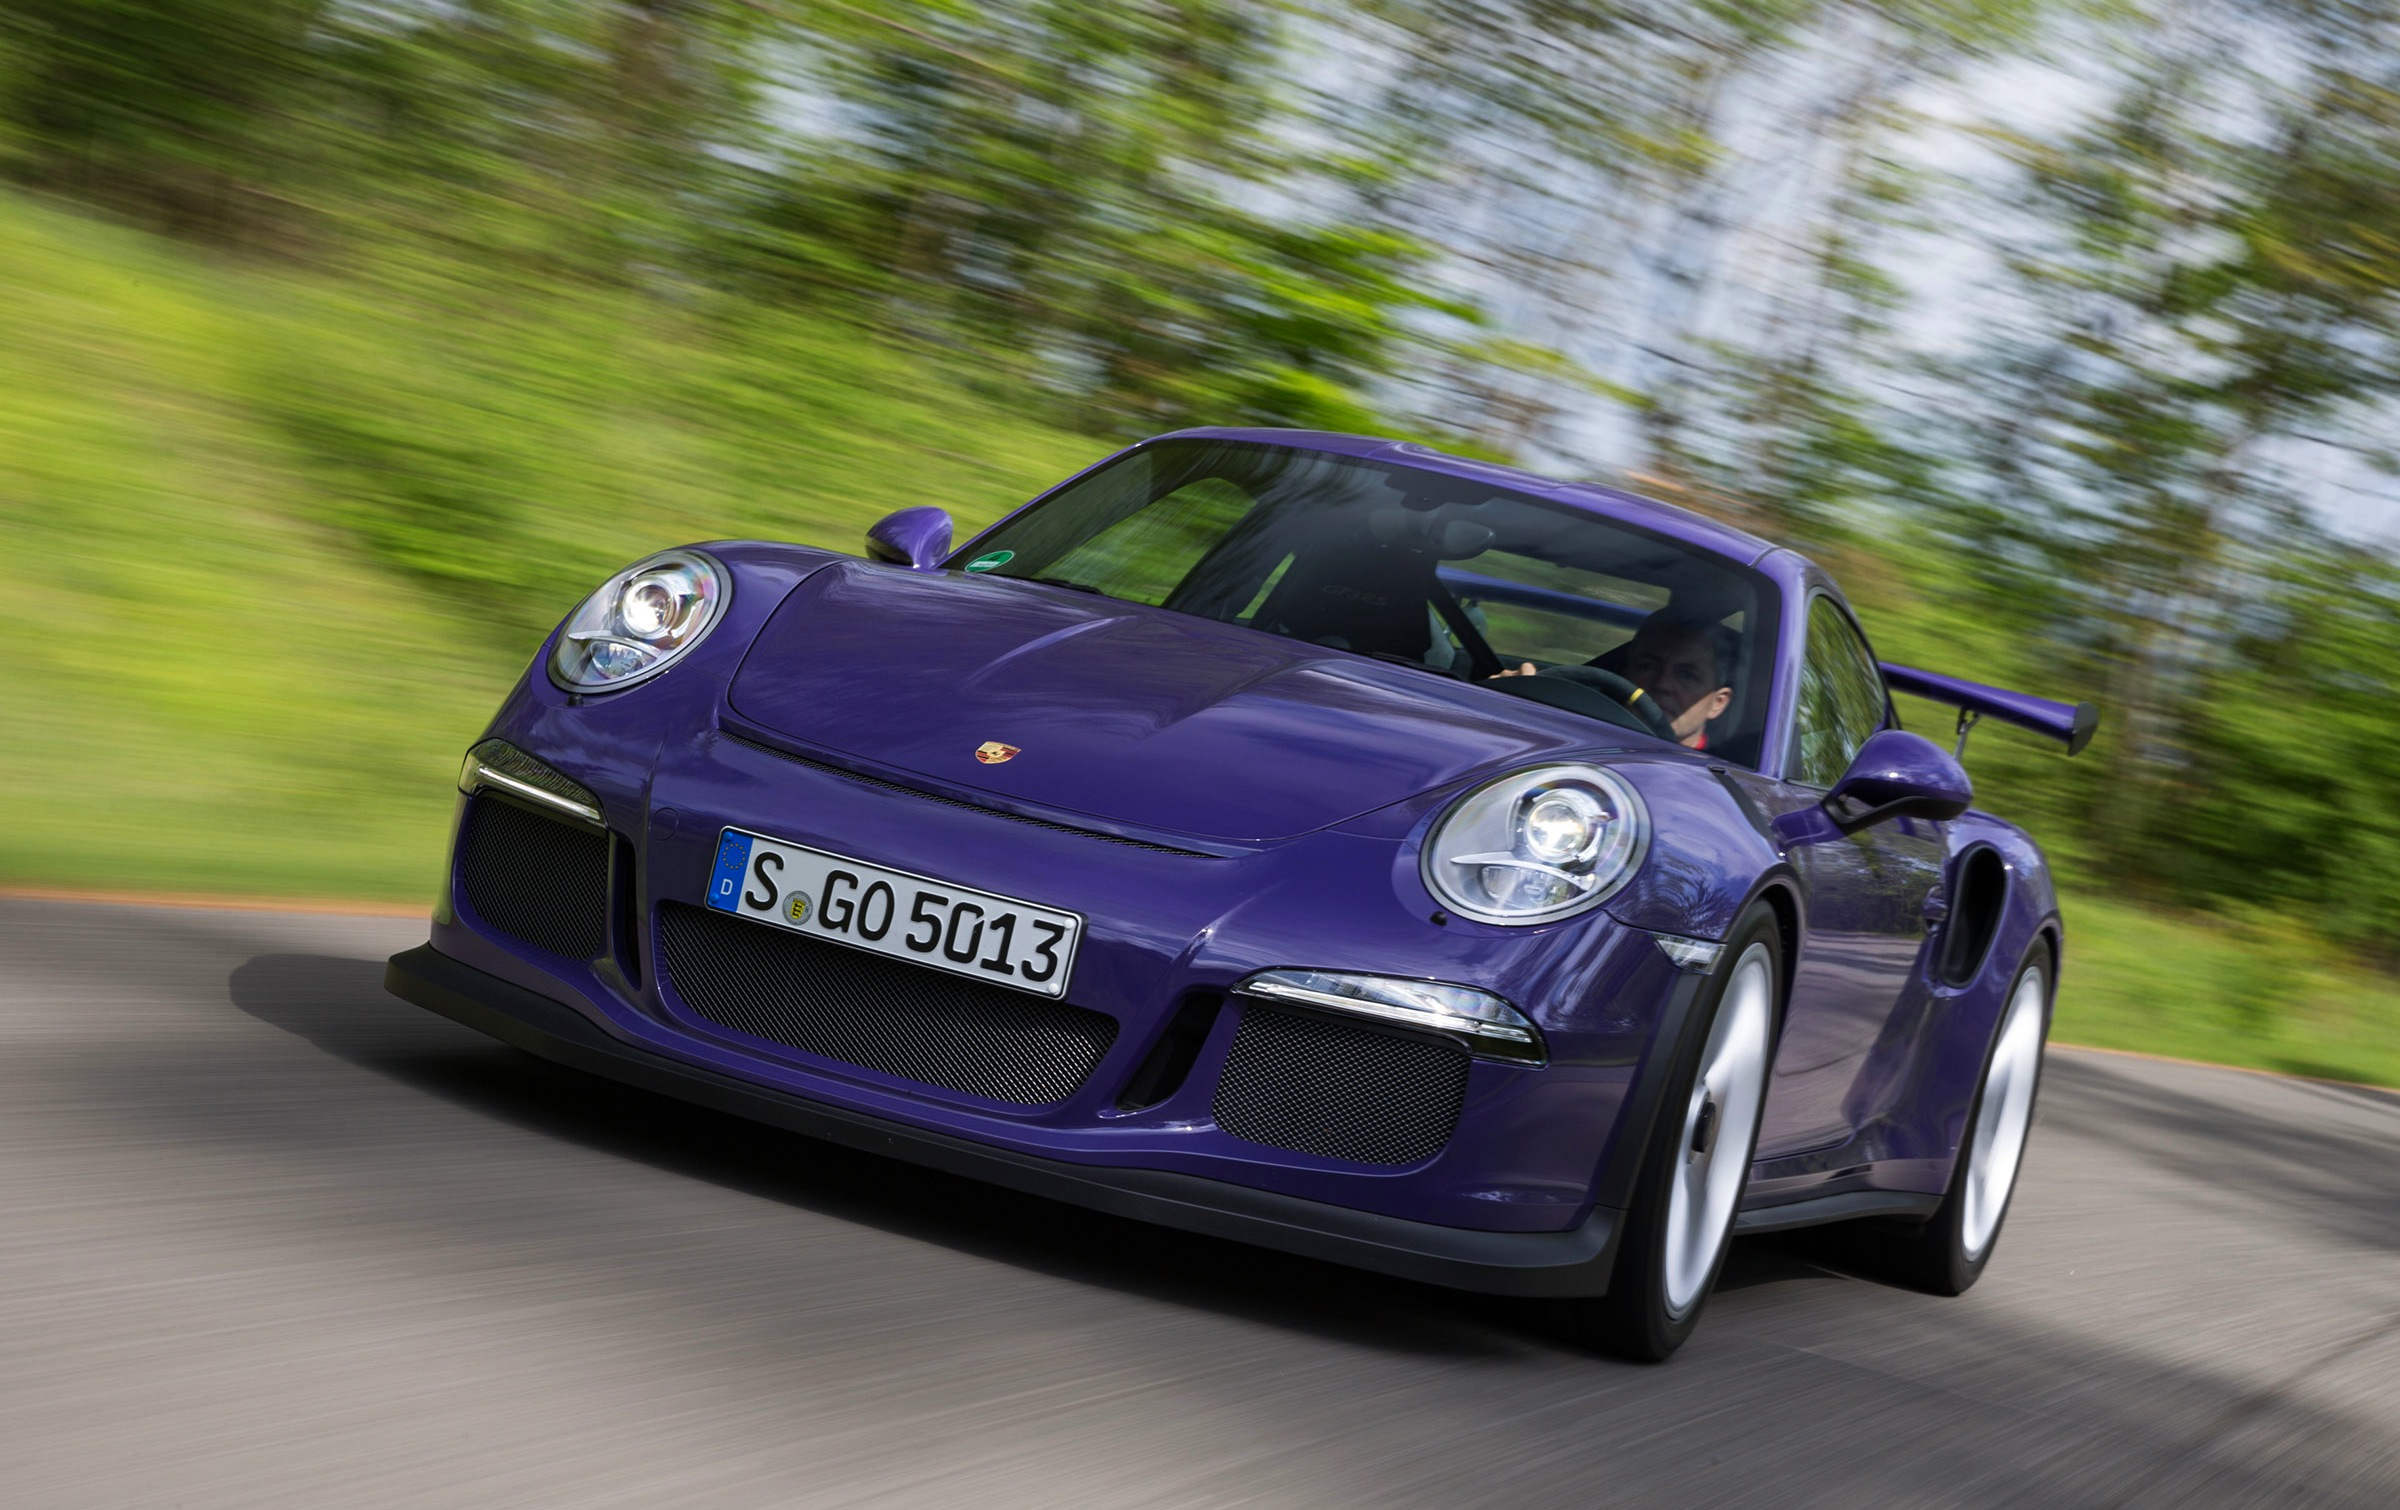 2015 Porsche 911 GT3 RS typ 991